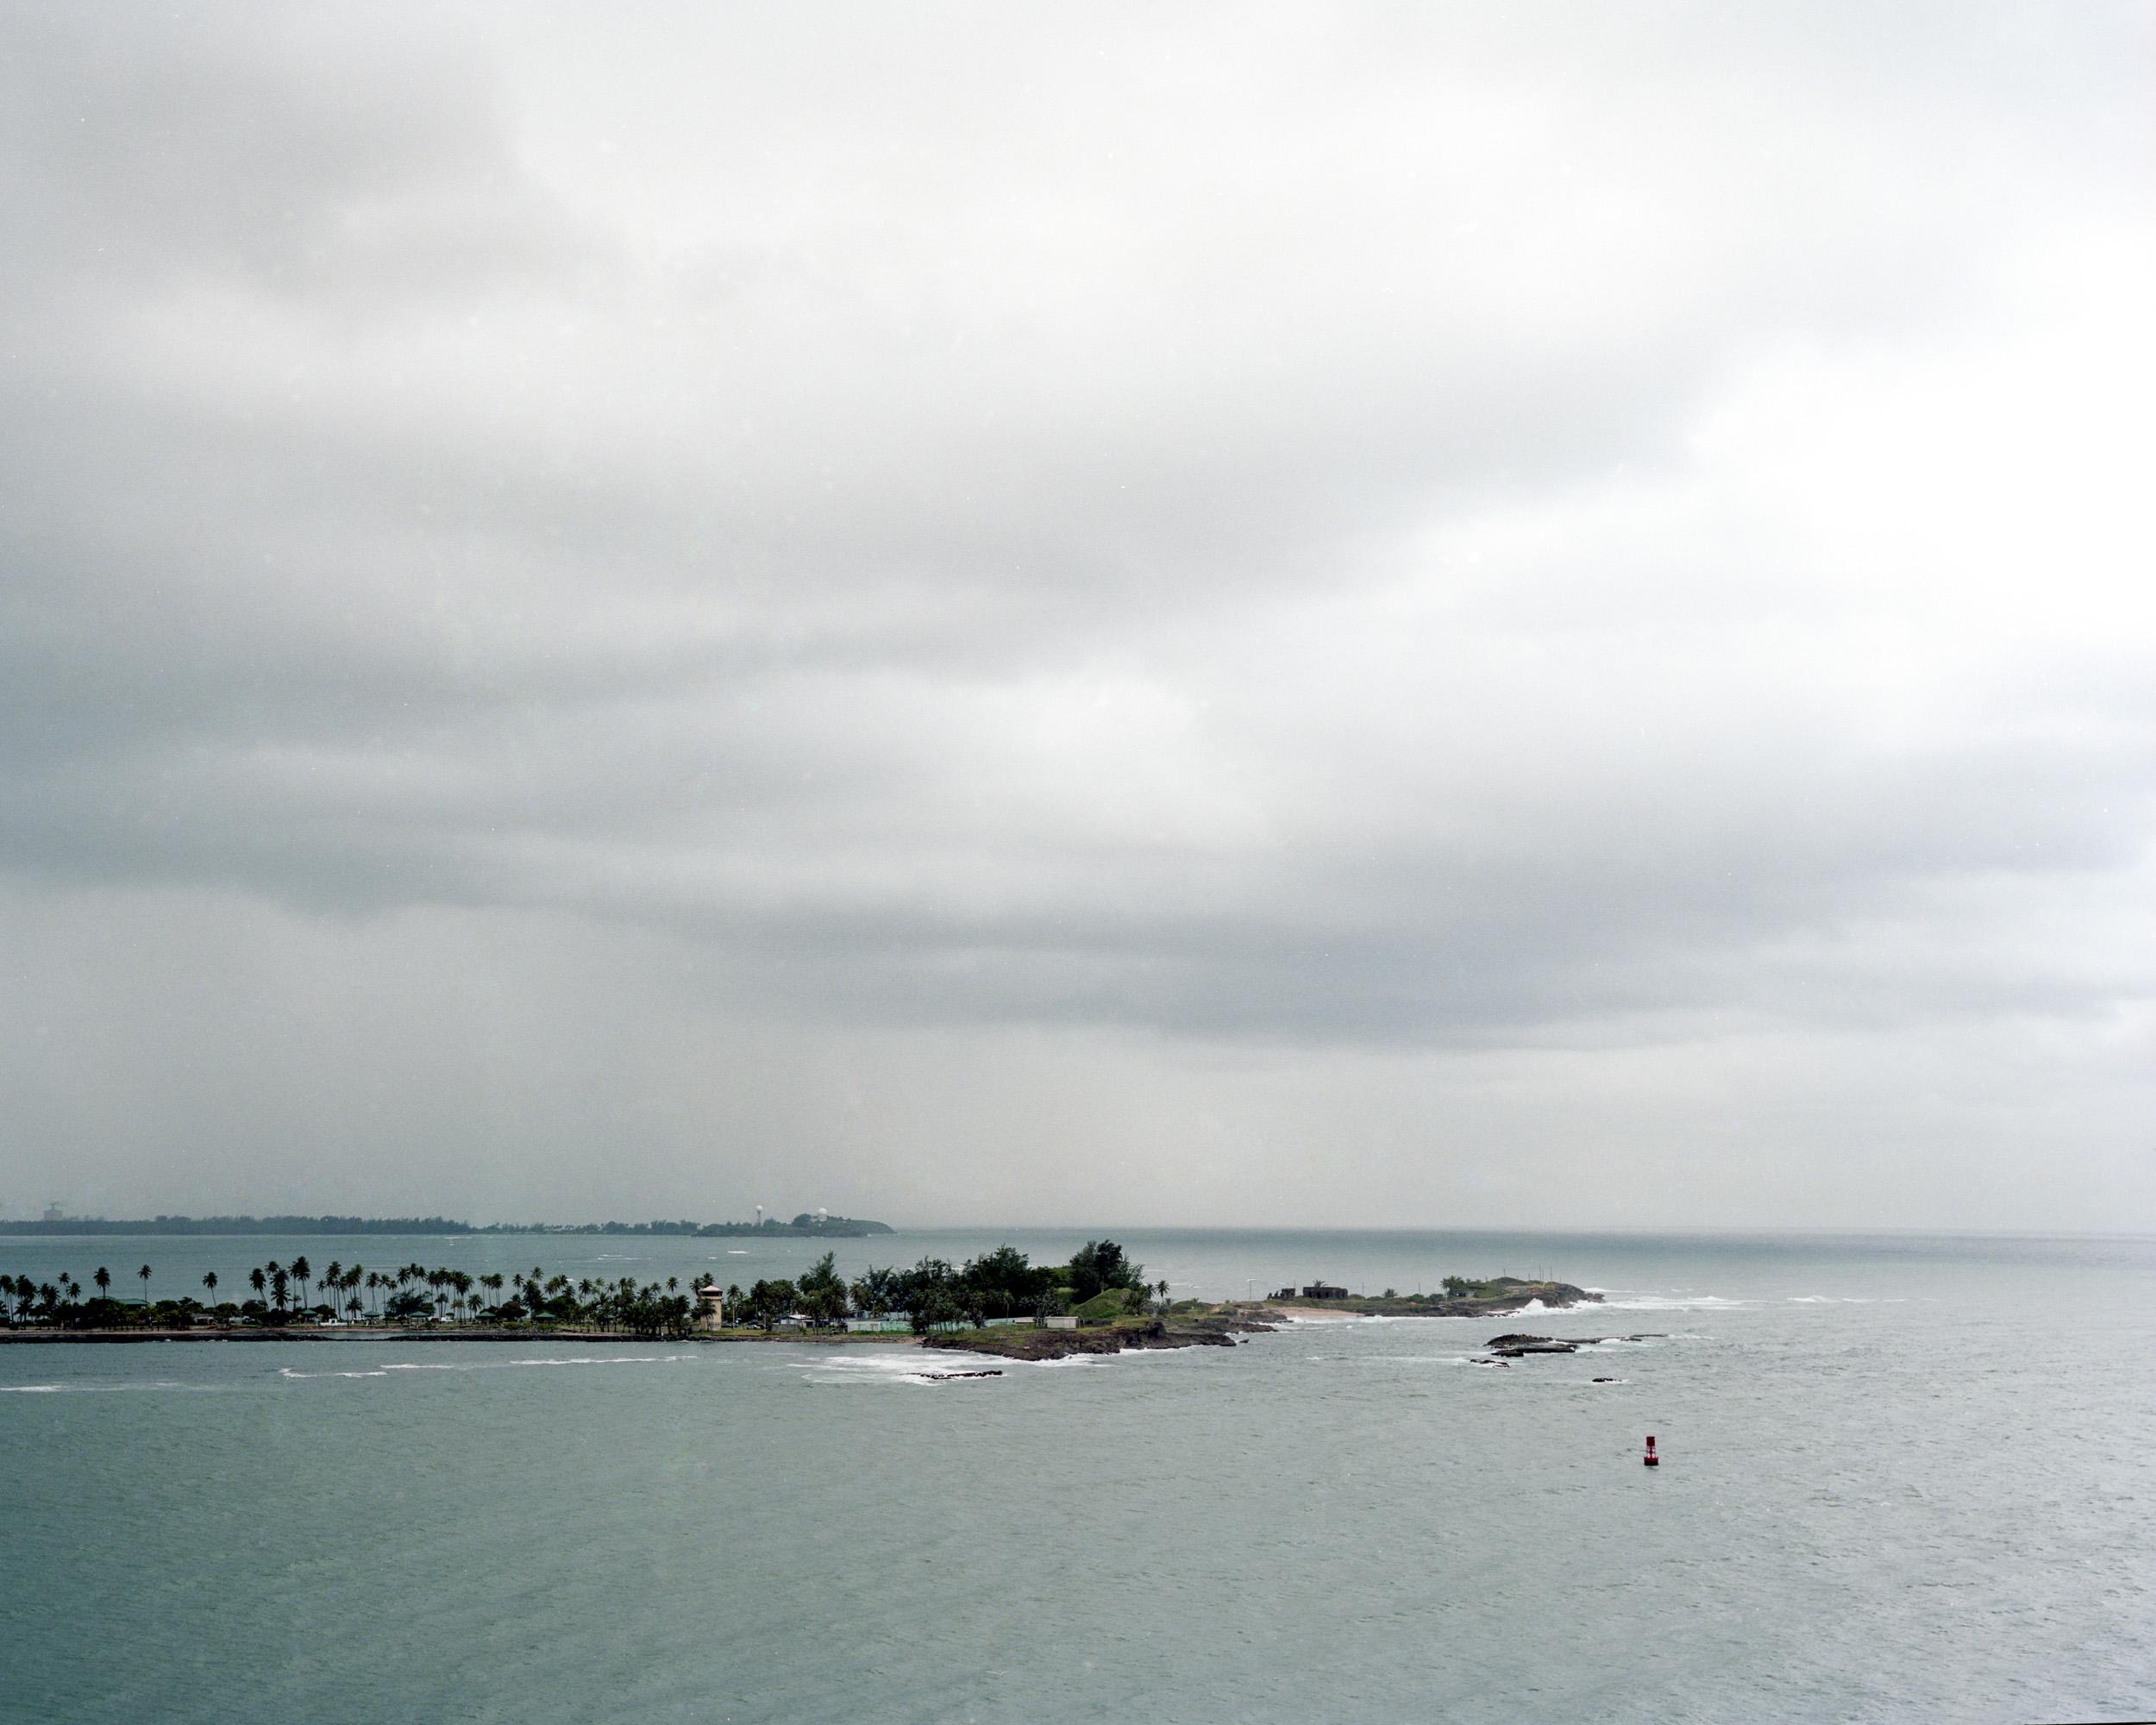 Puerto Rico024.jpg